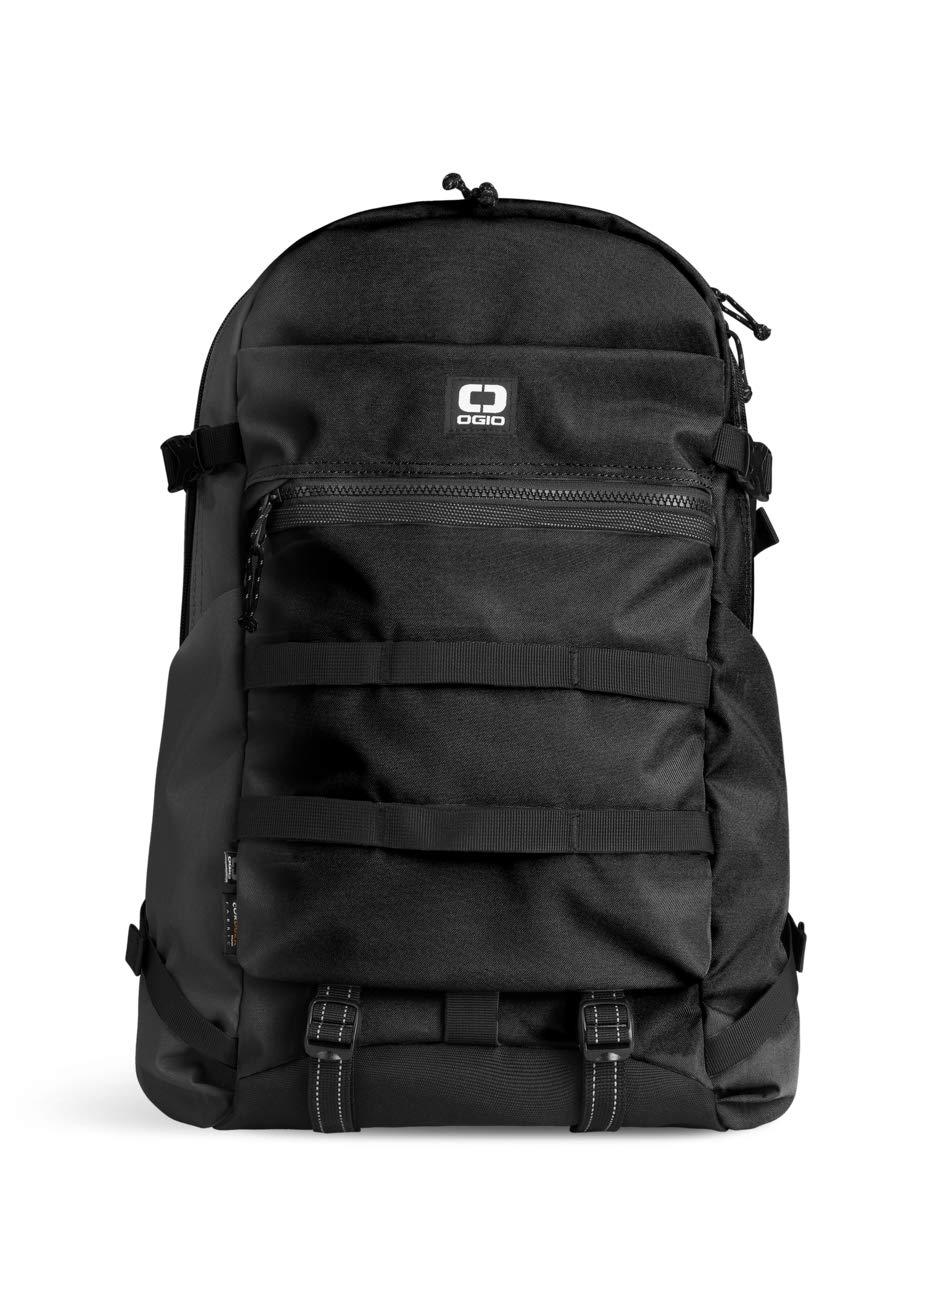 OGIO(オジオ) バックパック 320 2018年モデル ユニセックス ブラック   B07L9BB5PW